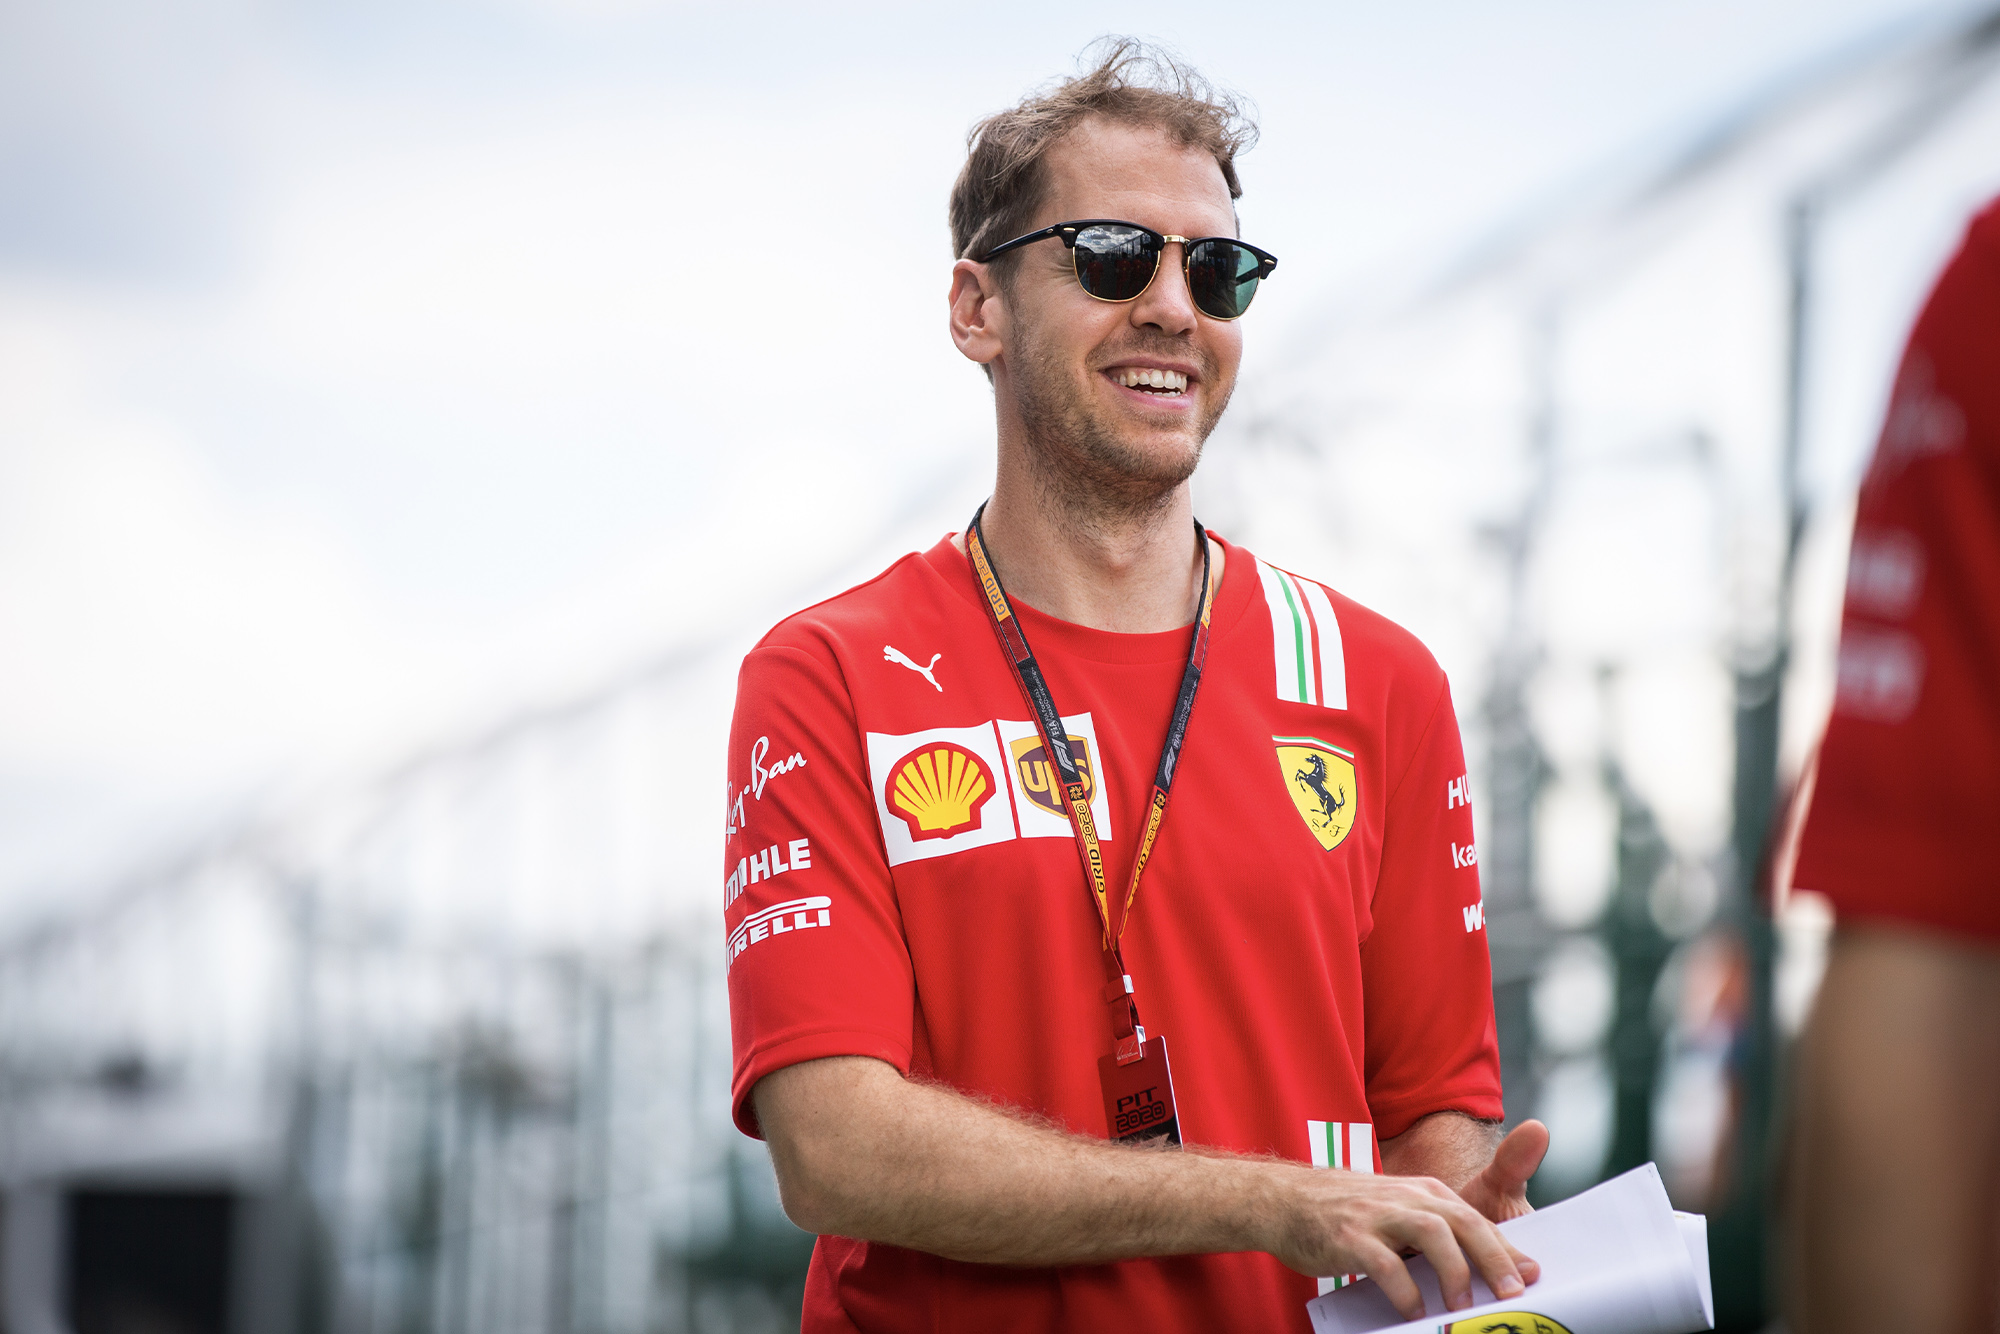 Sebastian Vettel in Melbourne ahead of the cancelled 2020 F1 Australian Grand Prix